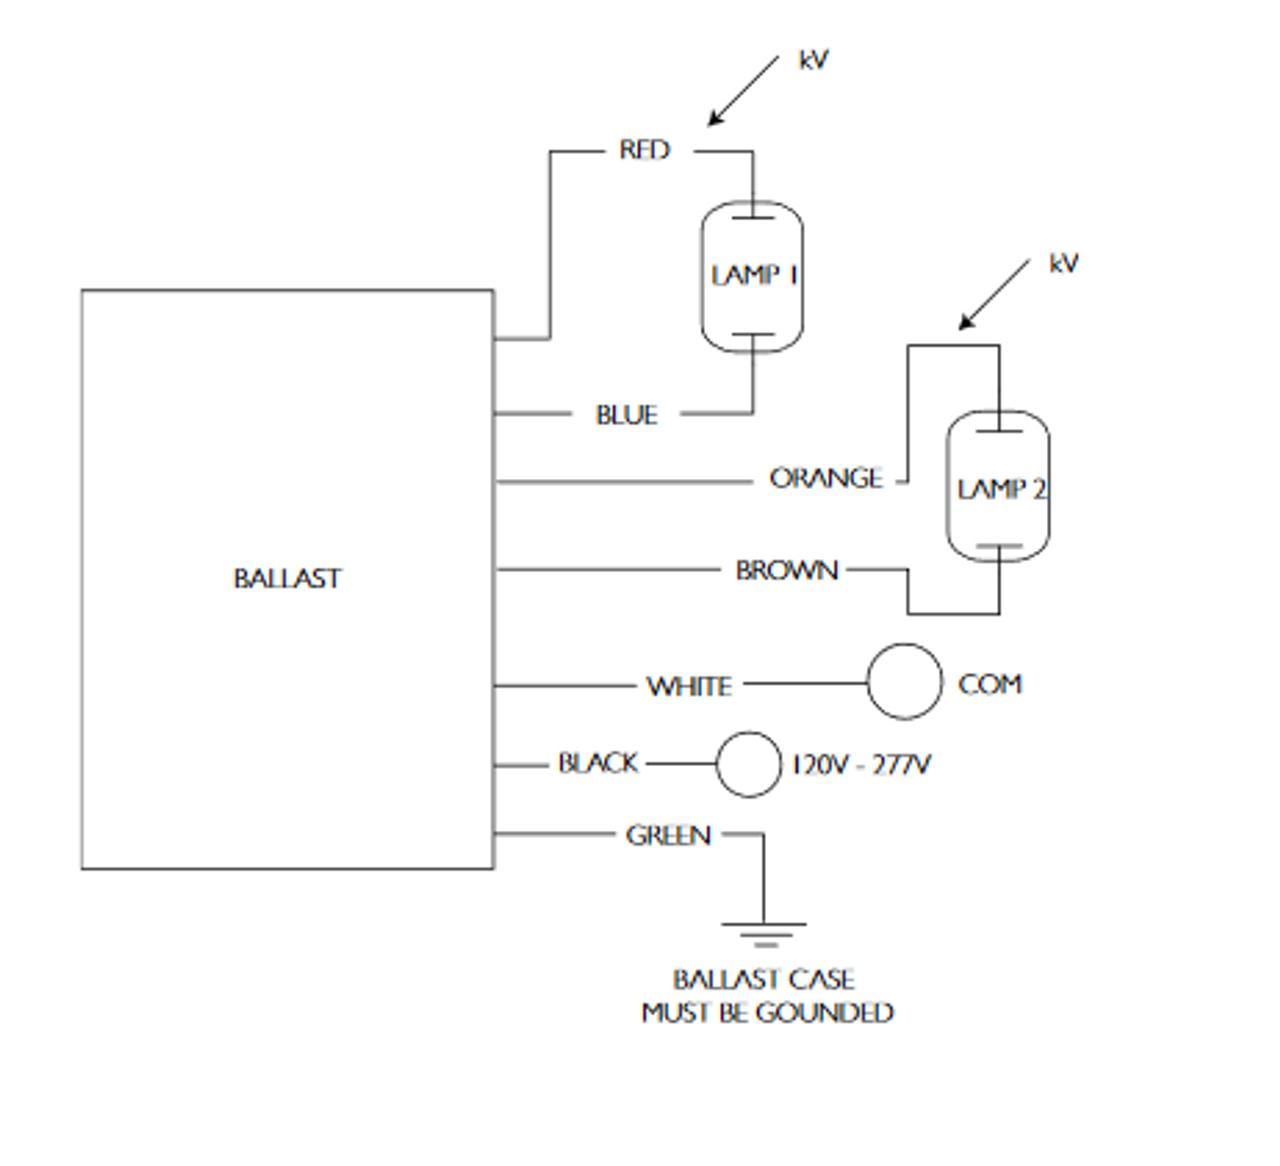 medium resolution of  philips advance ballast wiring diagram v on 1963 mopar ignition switch diagram ballast metal halide